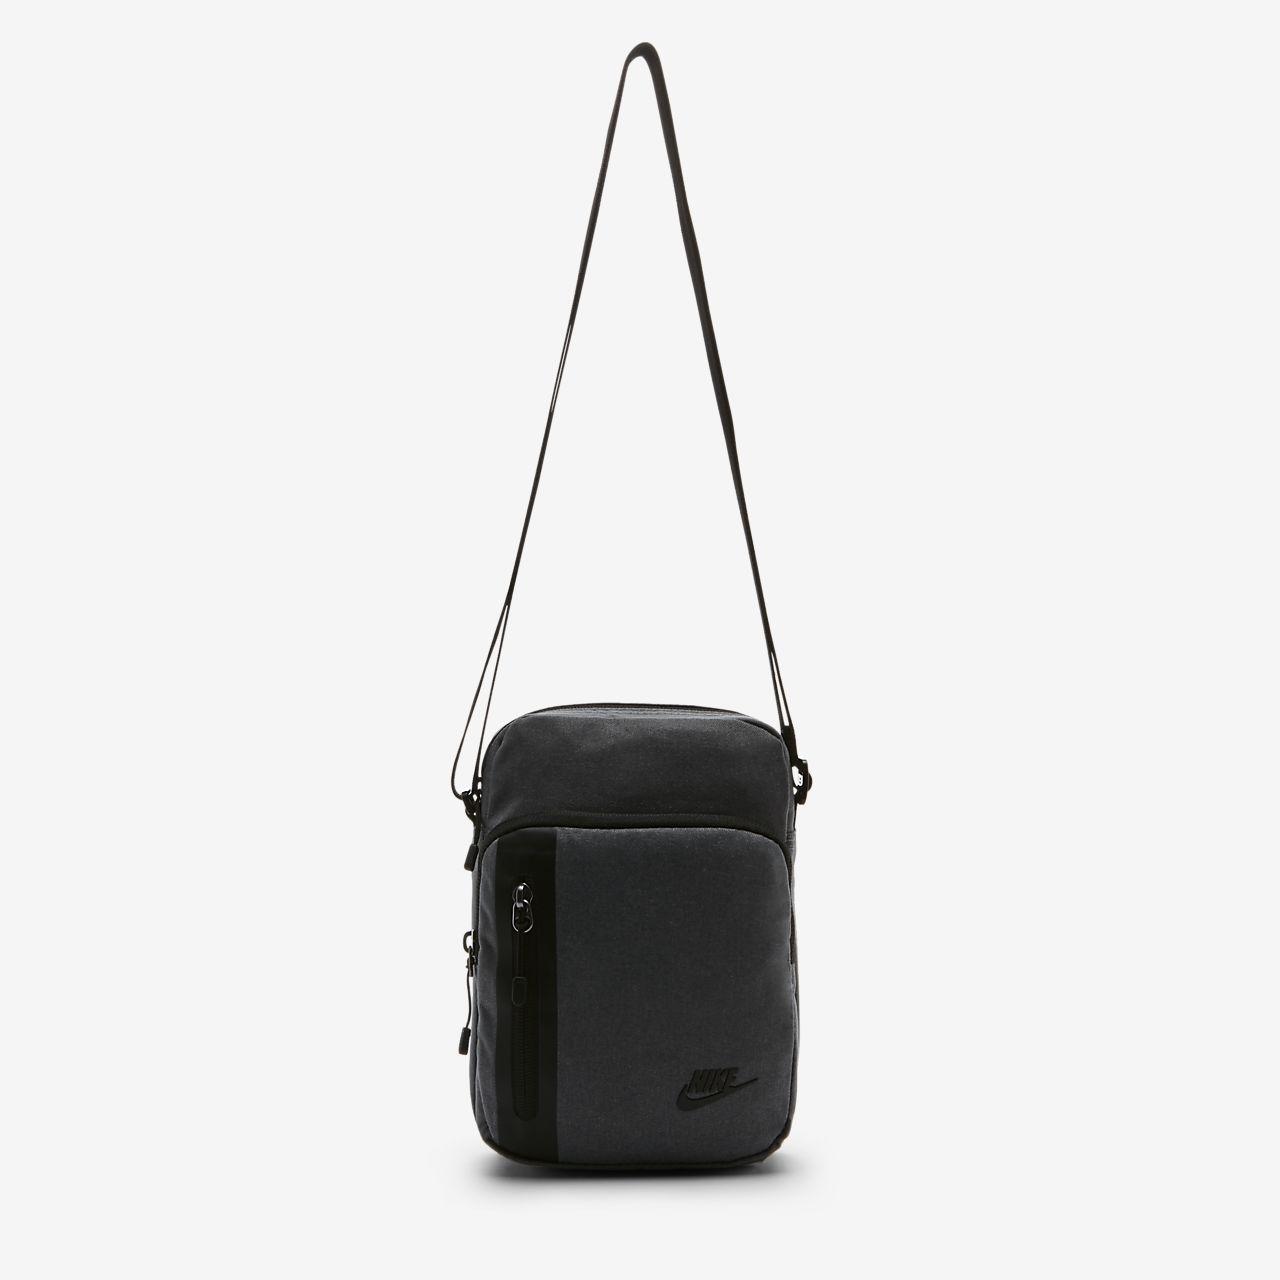 Sac Nike Core Small Items 3.0